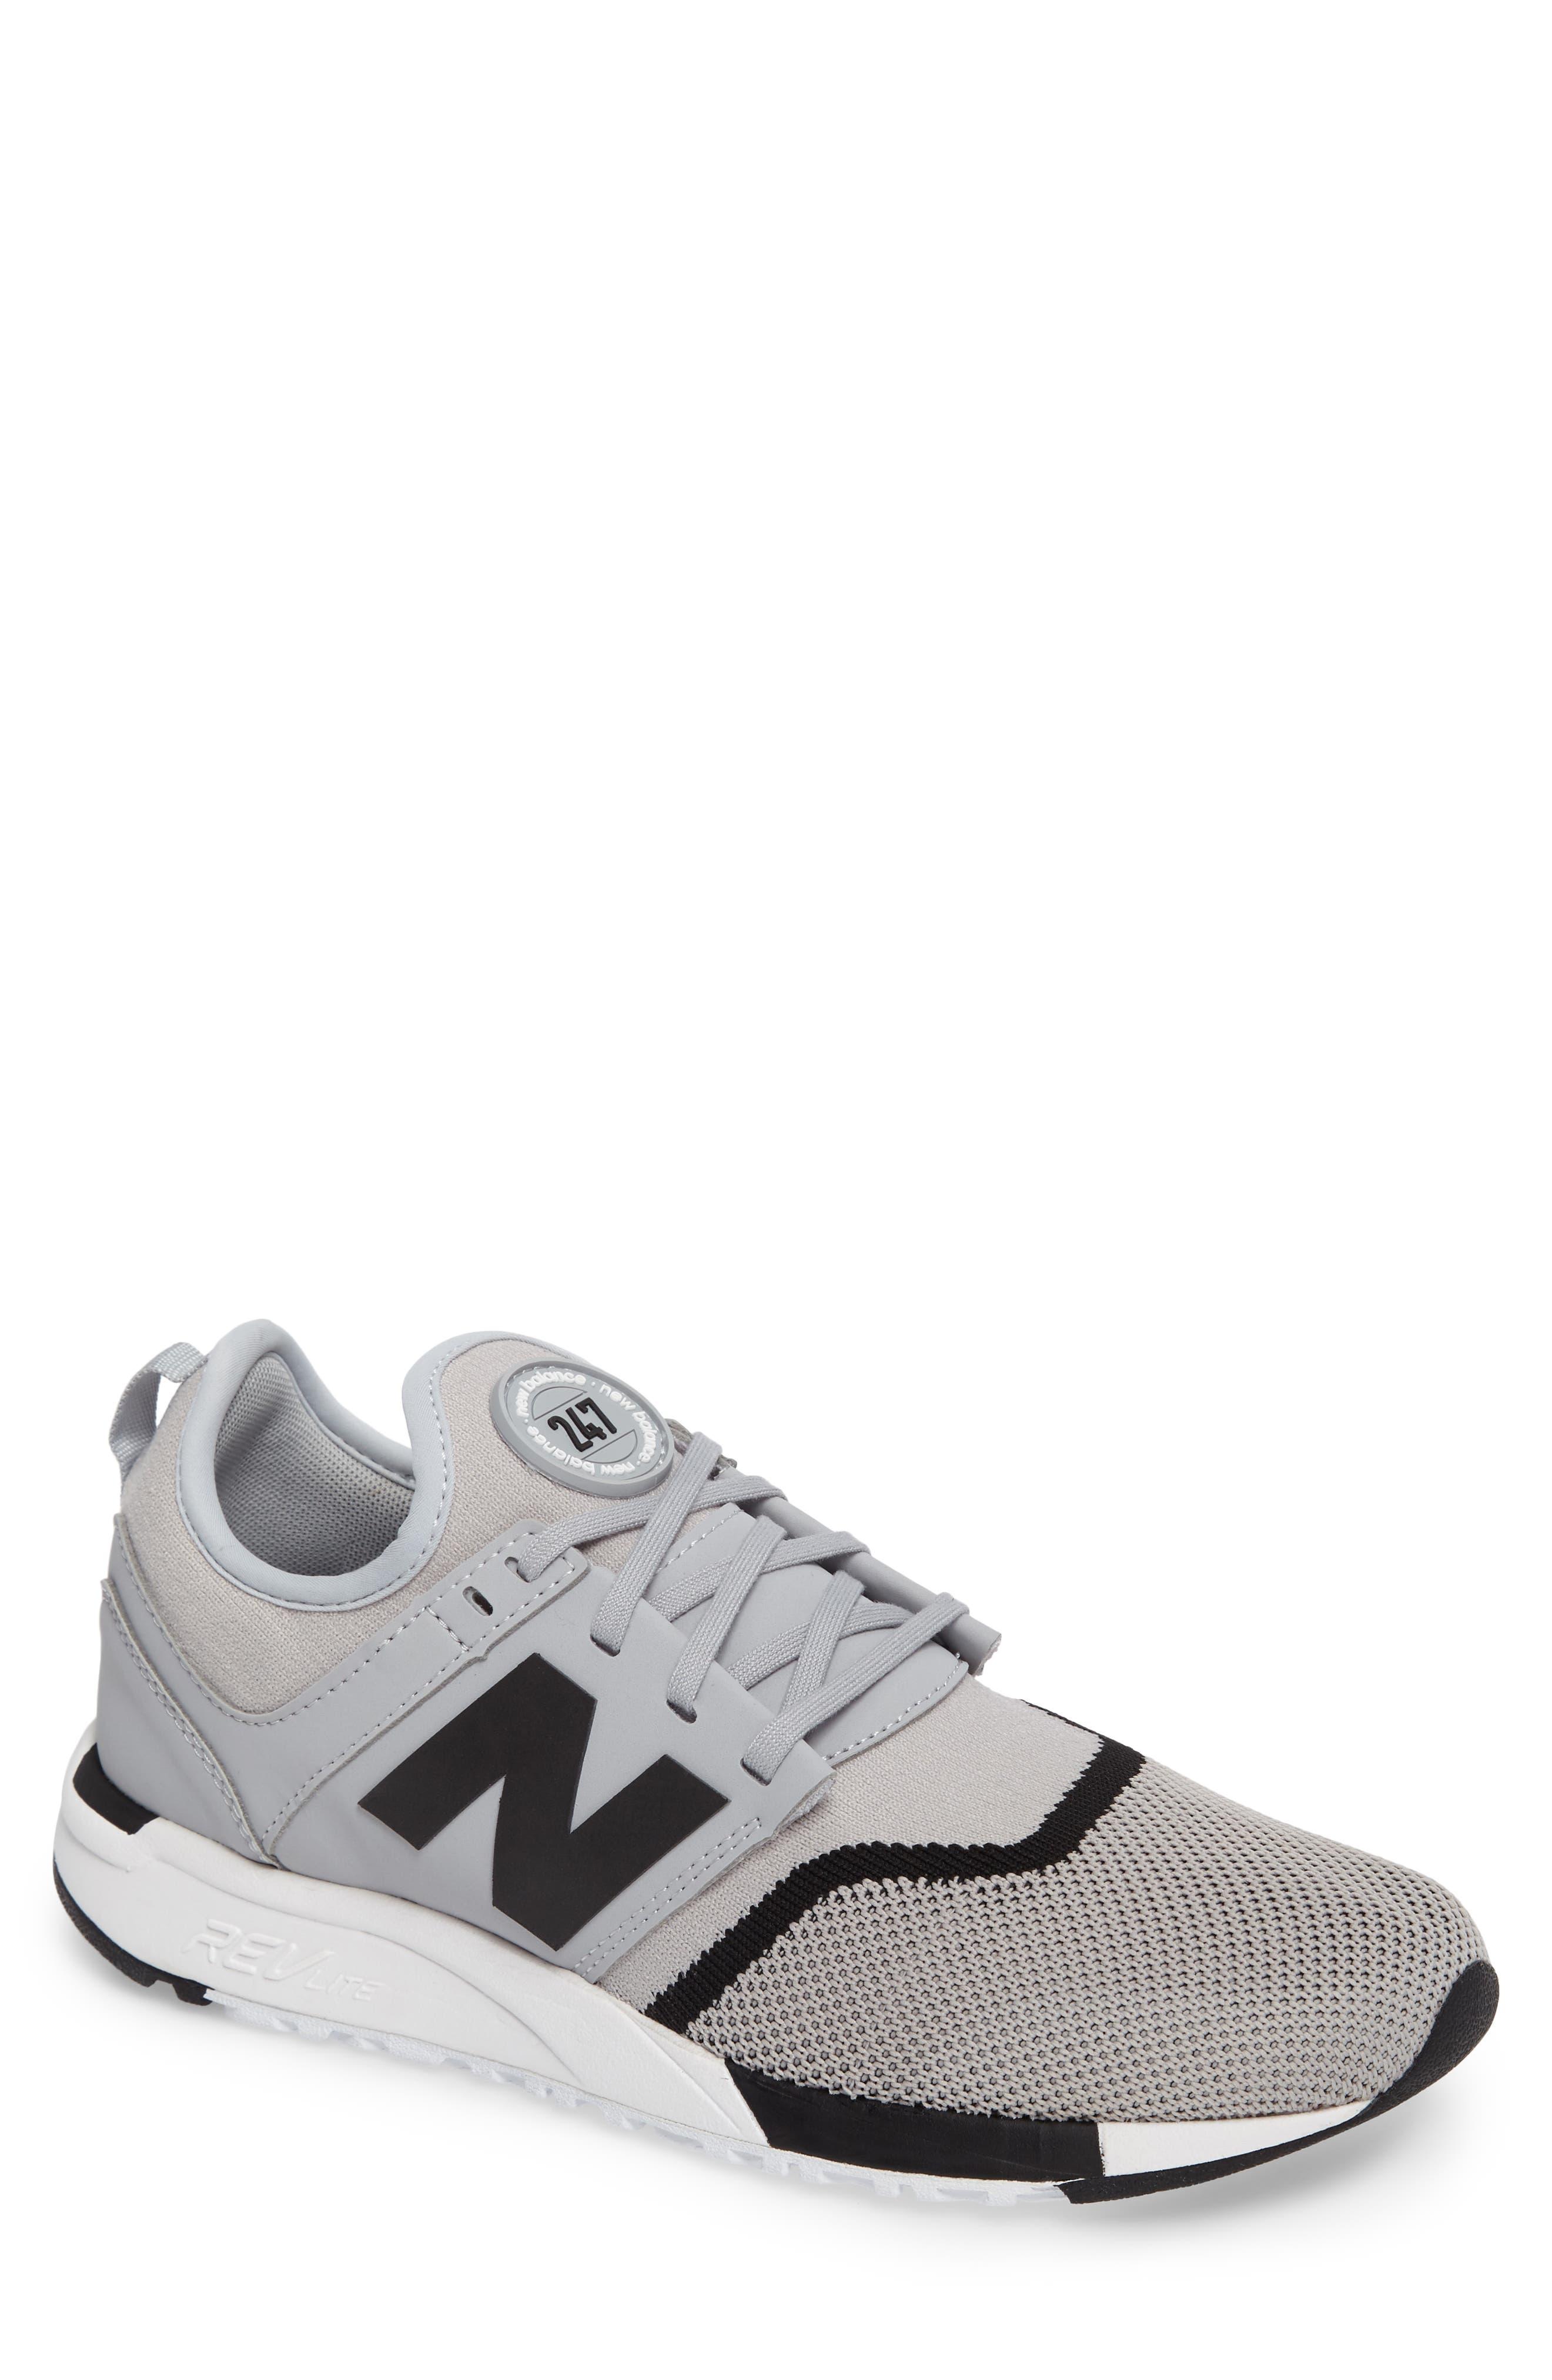 247 Sport Knit Sneaker,                         Main,                         color, 030